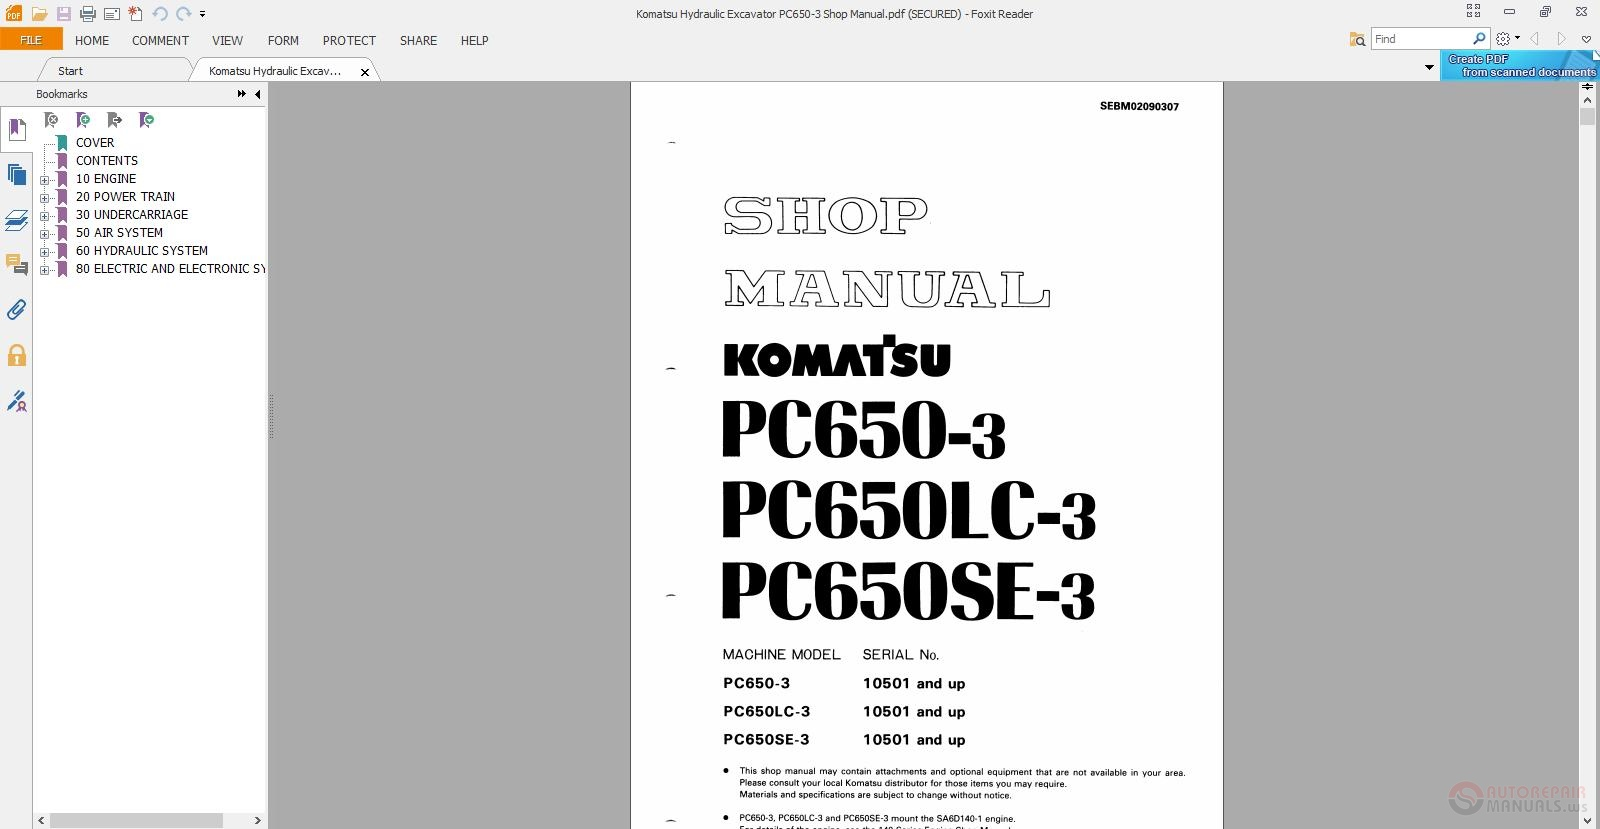 komatsu pc450 lc-8 pdf